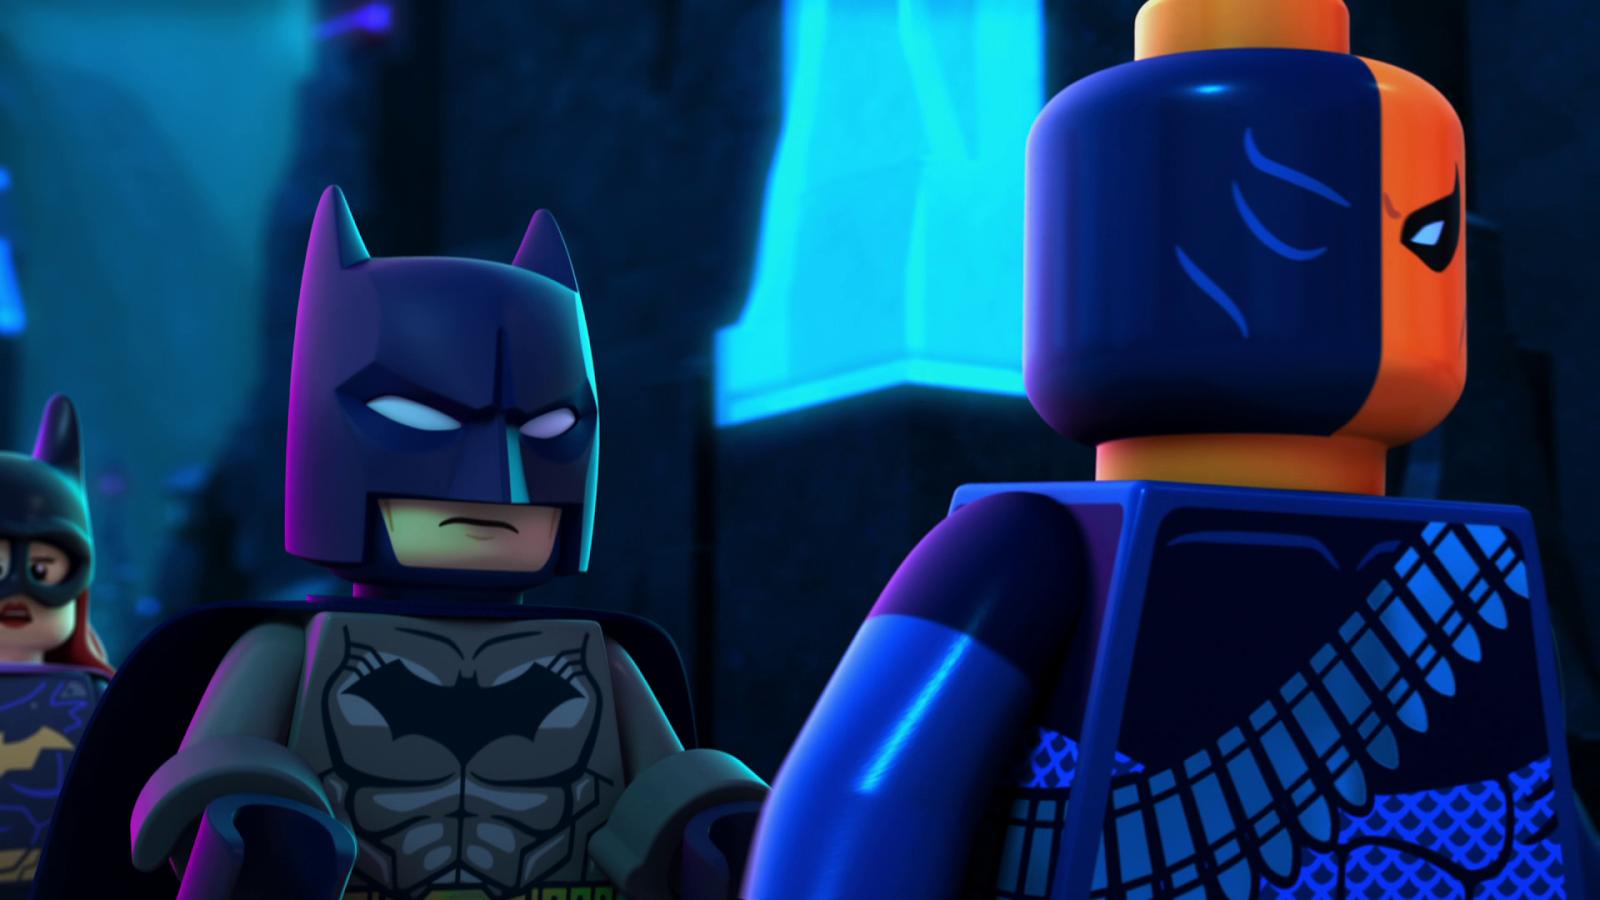 Lego DC Comics Superheroes Justice League - Gotham City Breakout (2016) 1080p BD25 5